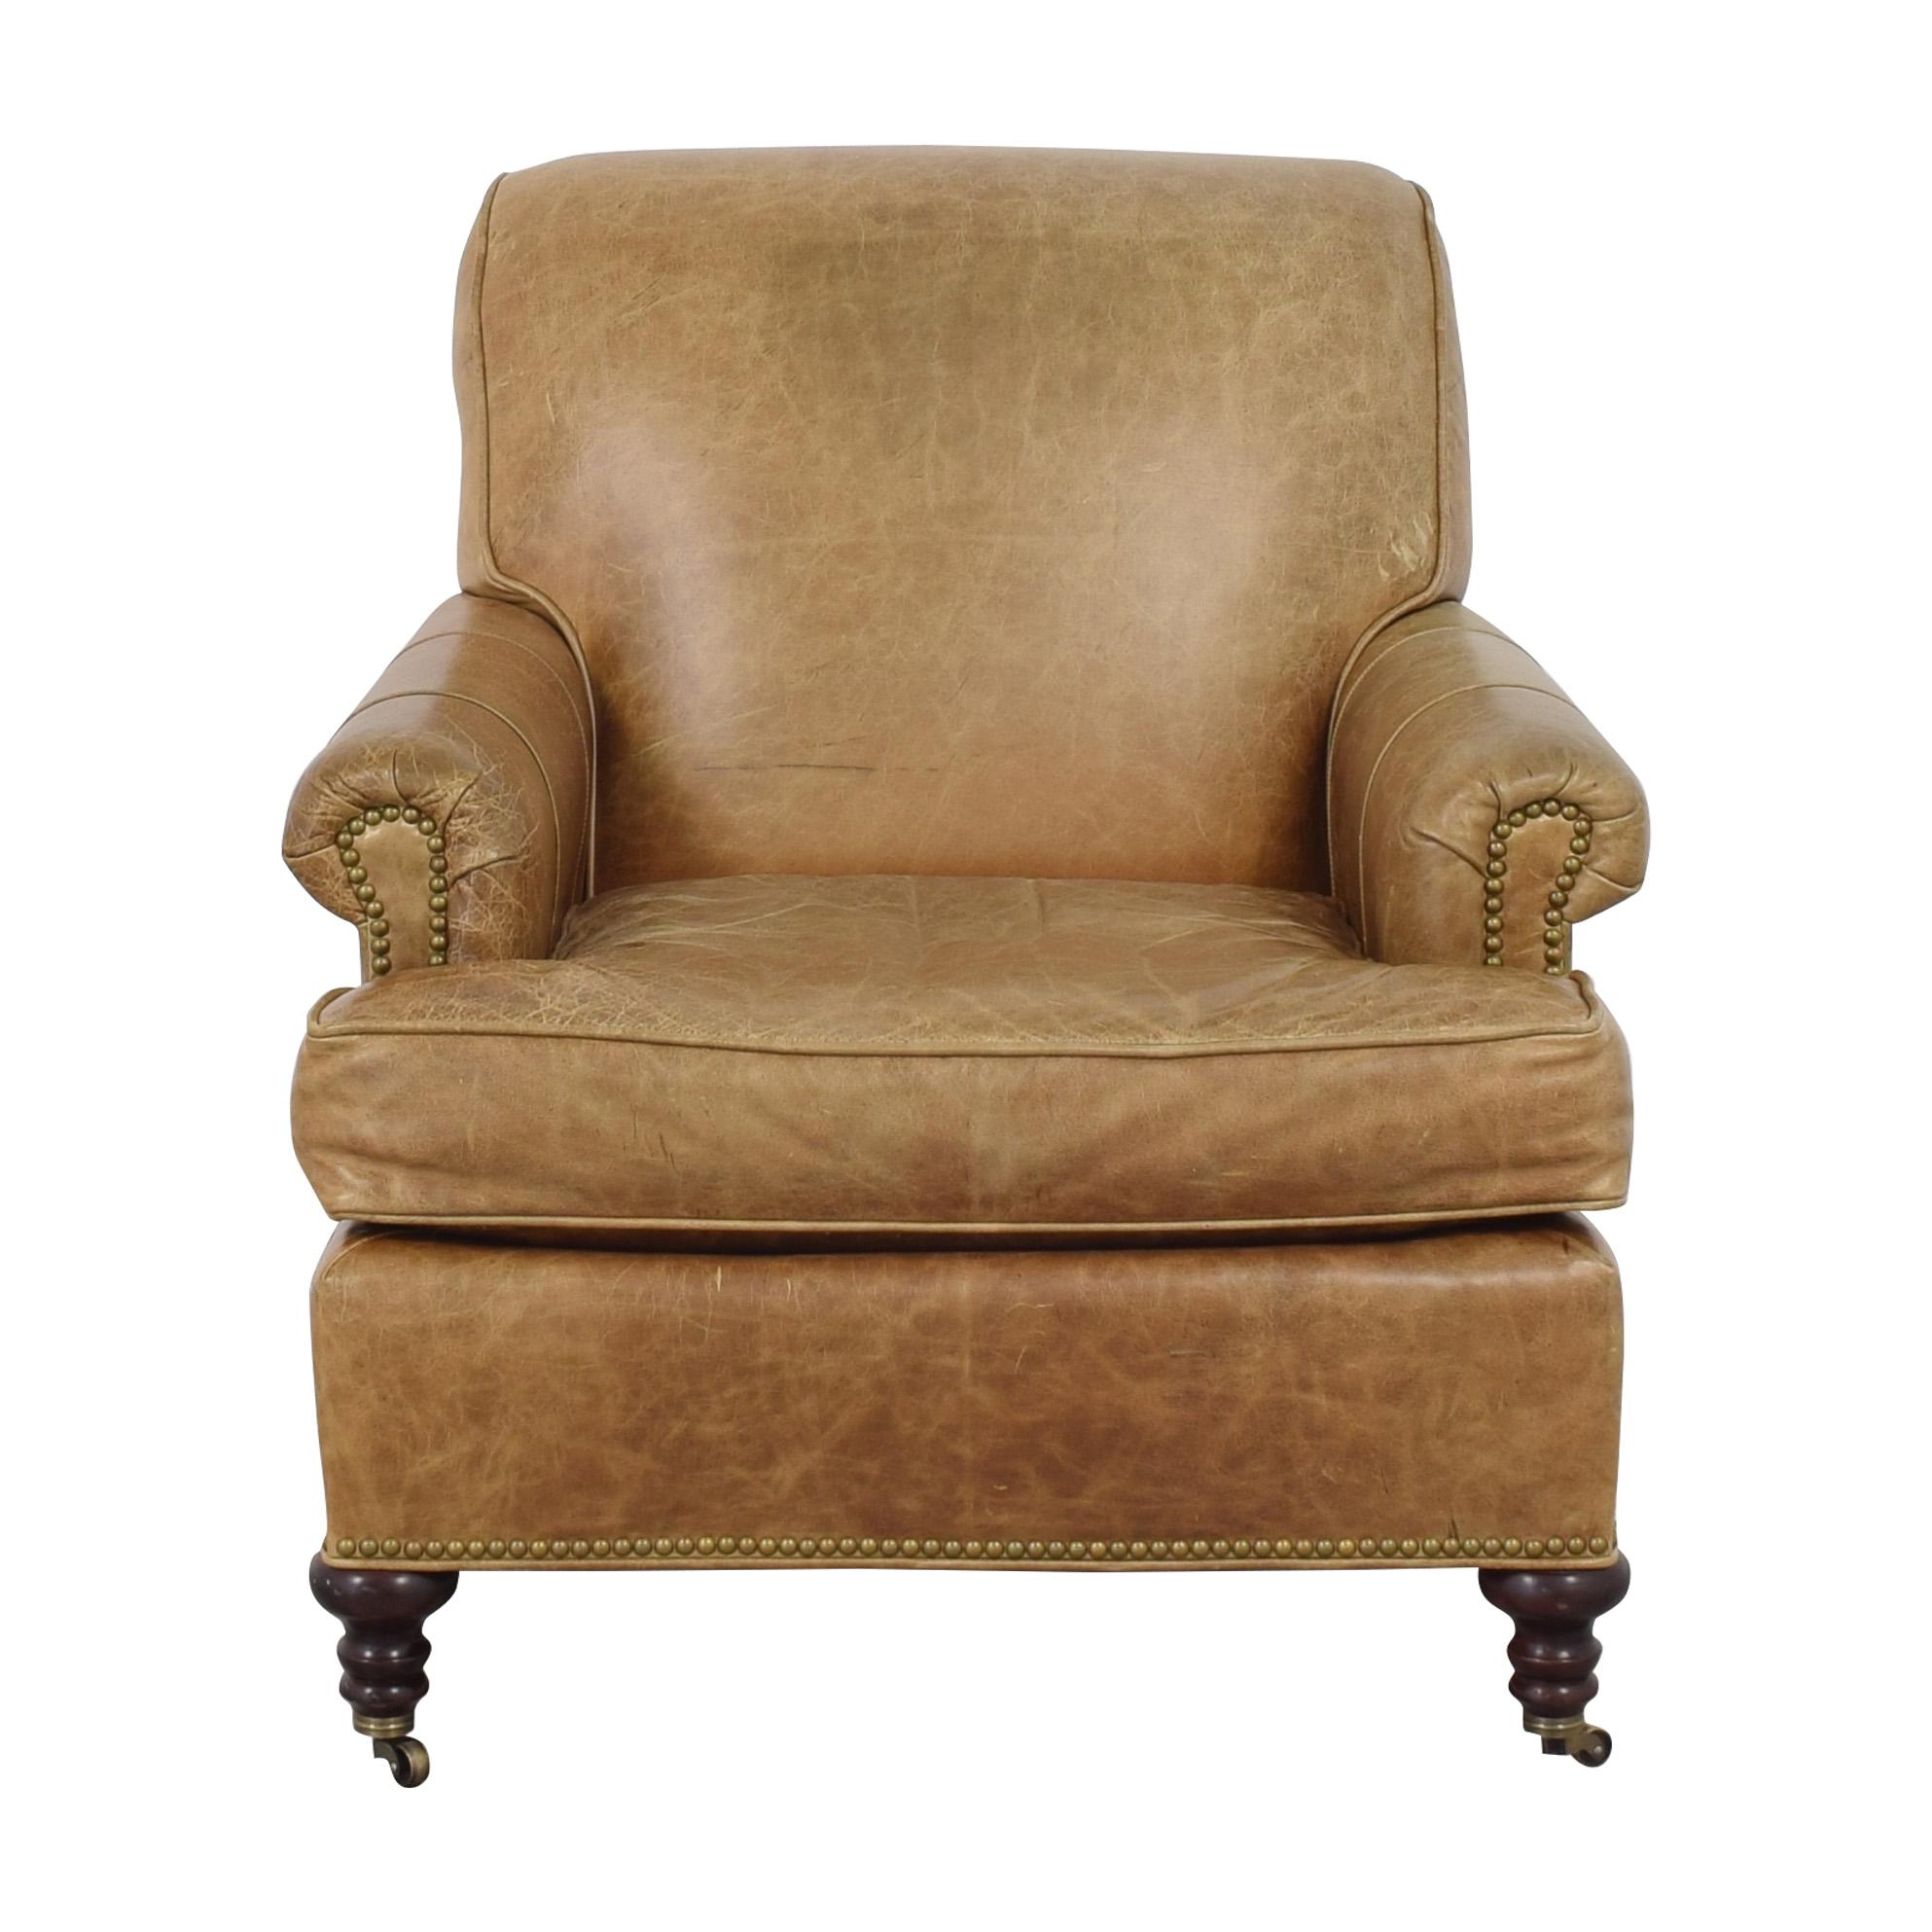 Burke Decor Southwood Club Chair coupon